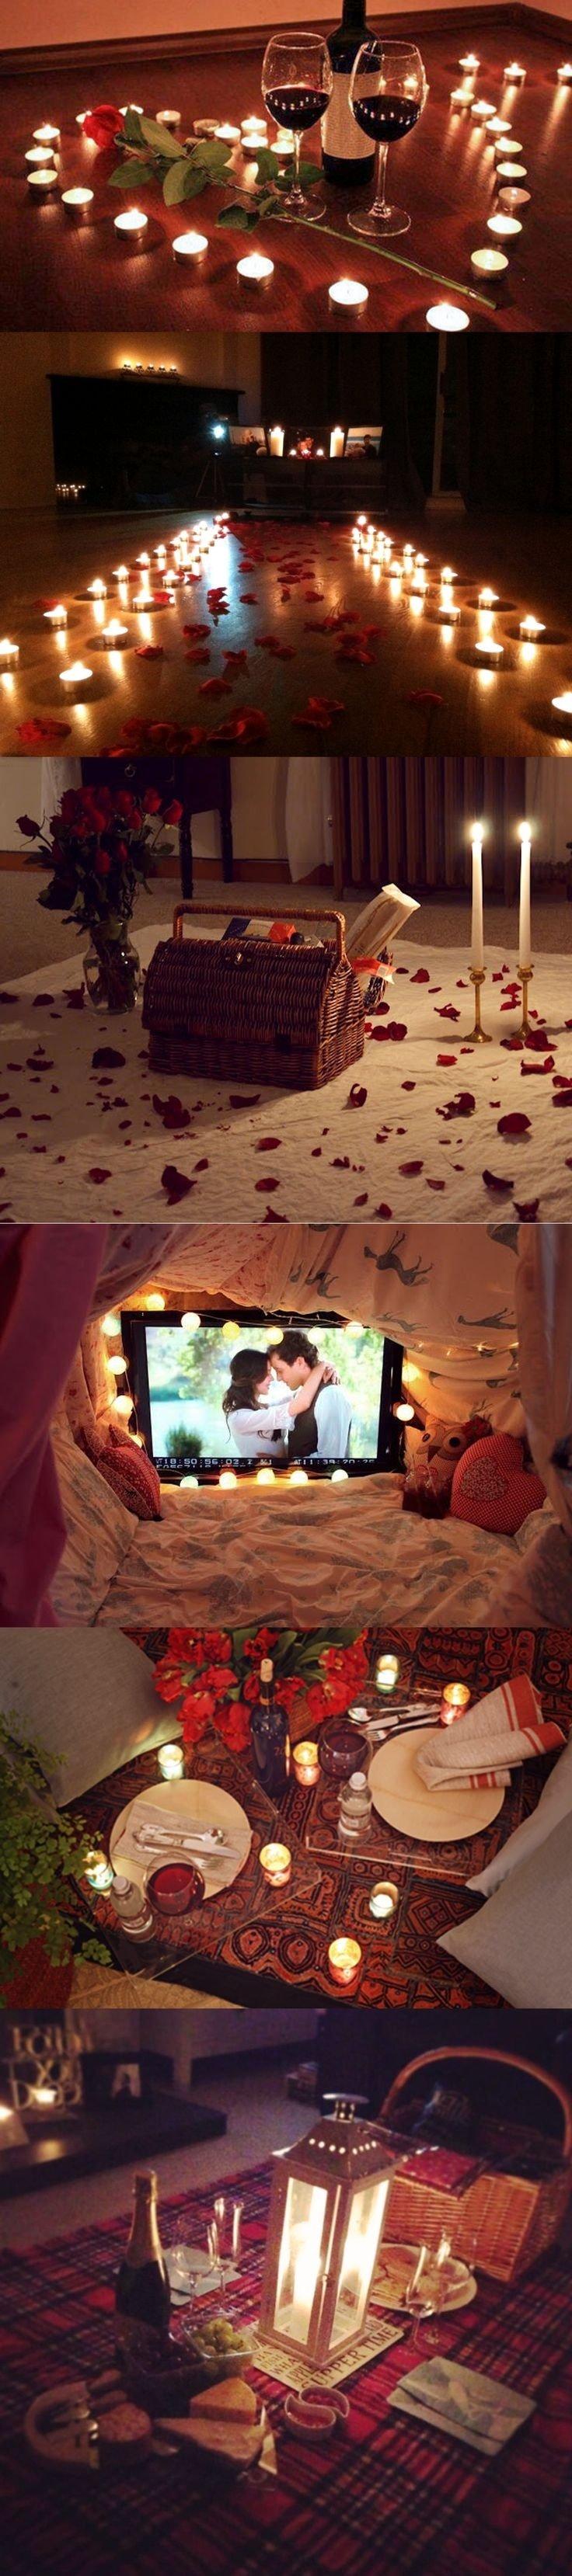 10 Unique Romantic Date Ideas For Him 453 best ideas for couples images on pinterest gift ideas 1 2020